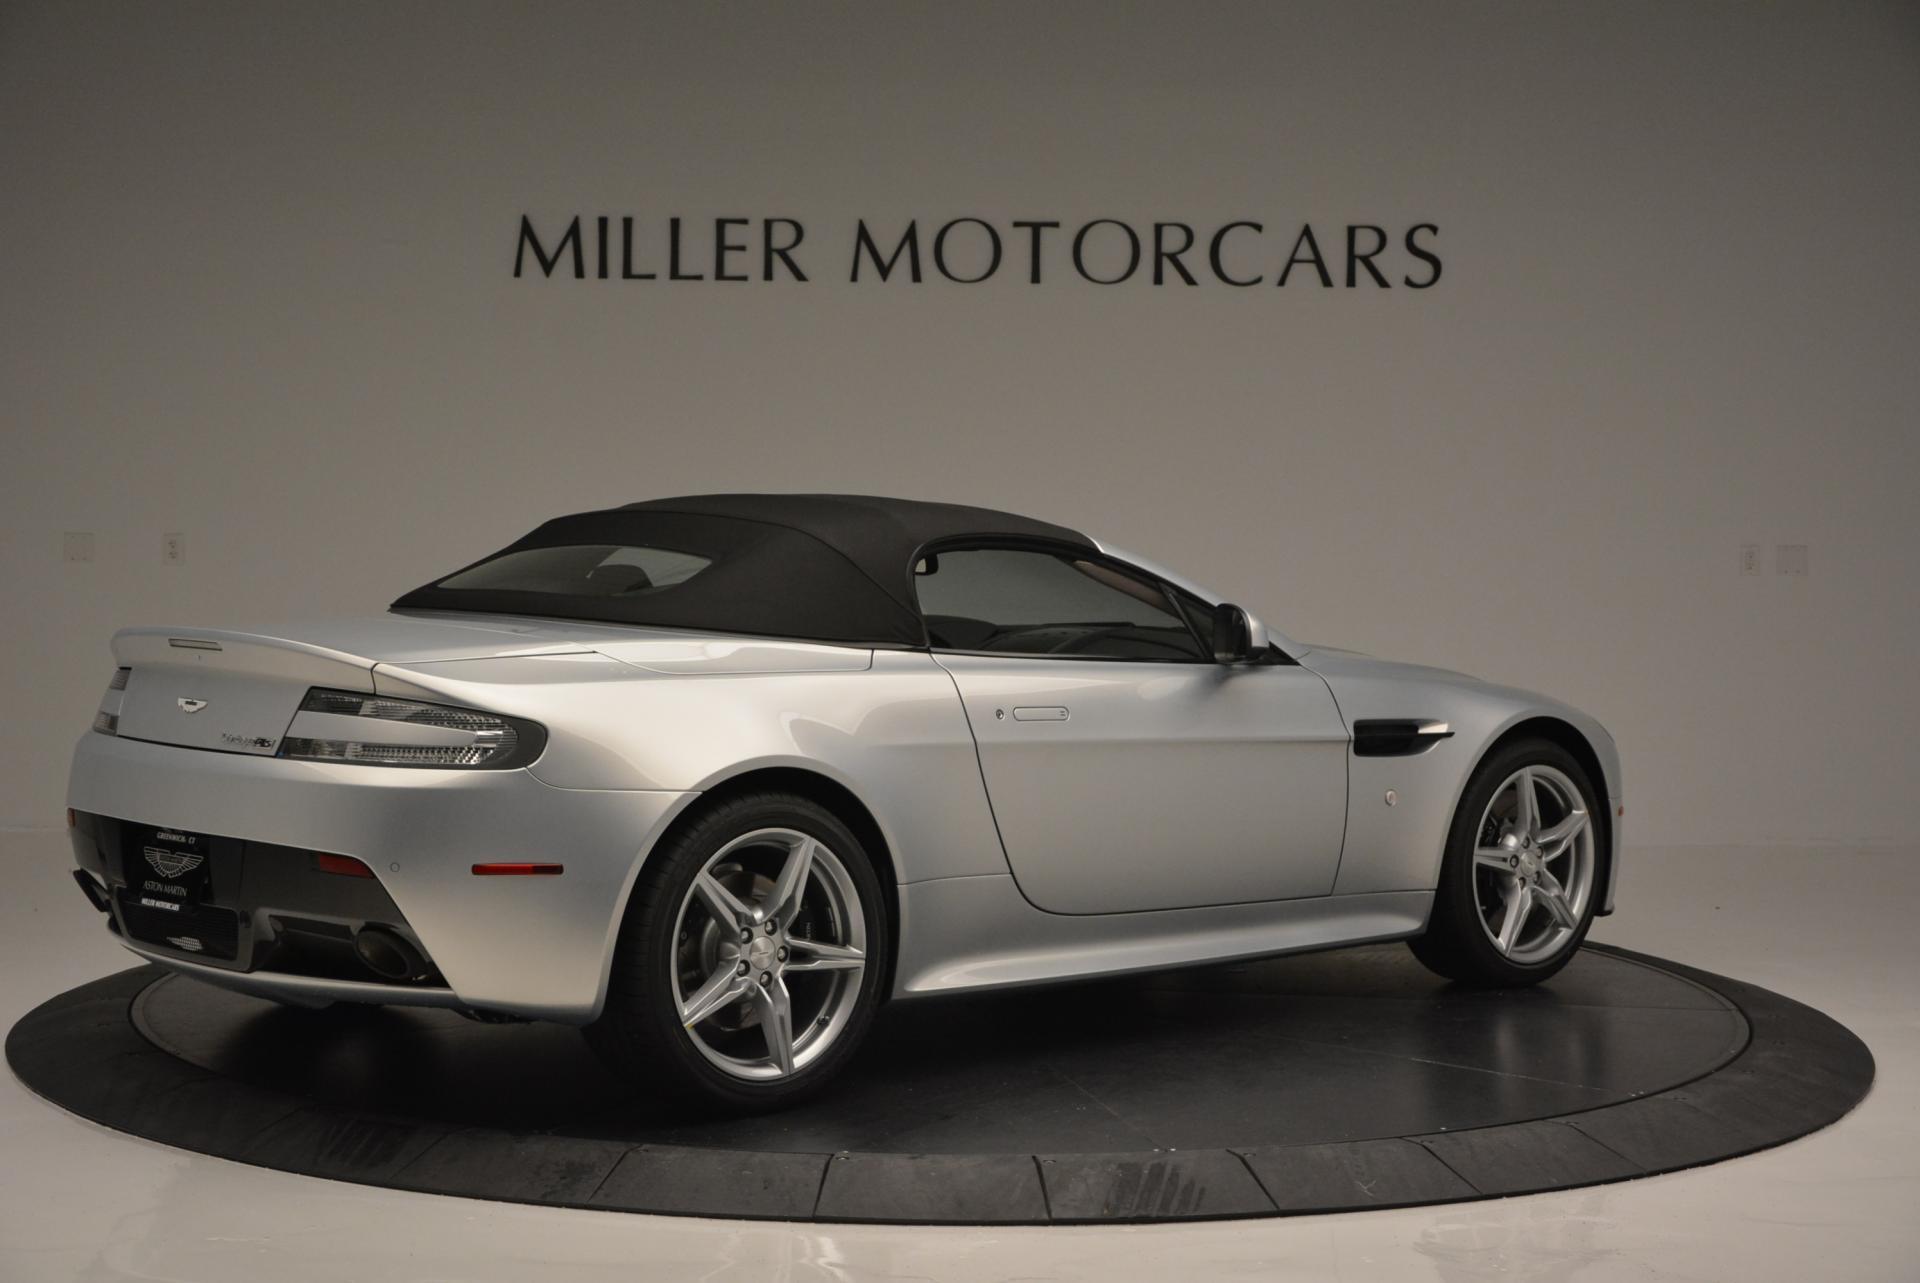 New 2016 Aston Martin V8 Vantage GTS Roadster For Sale In Westport, CT 90_p18